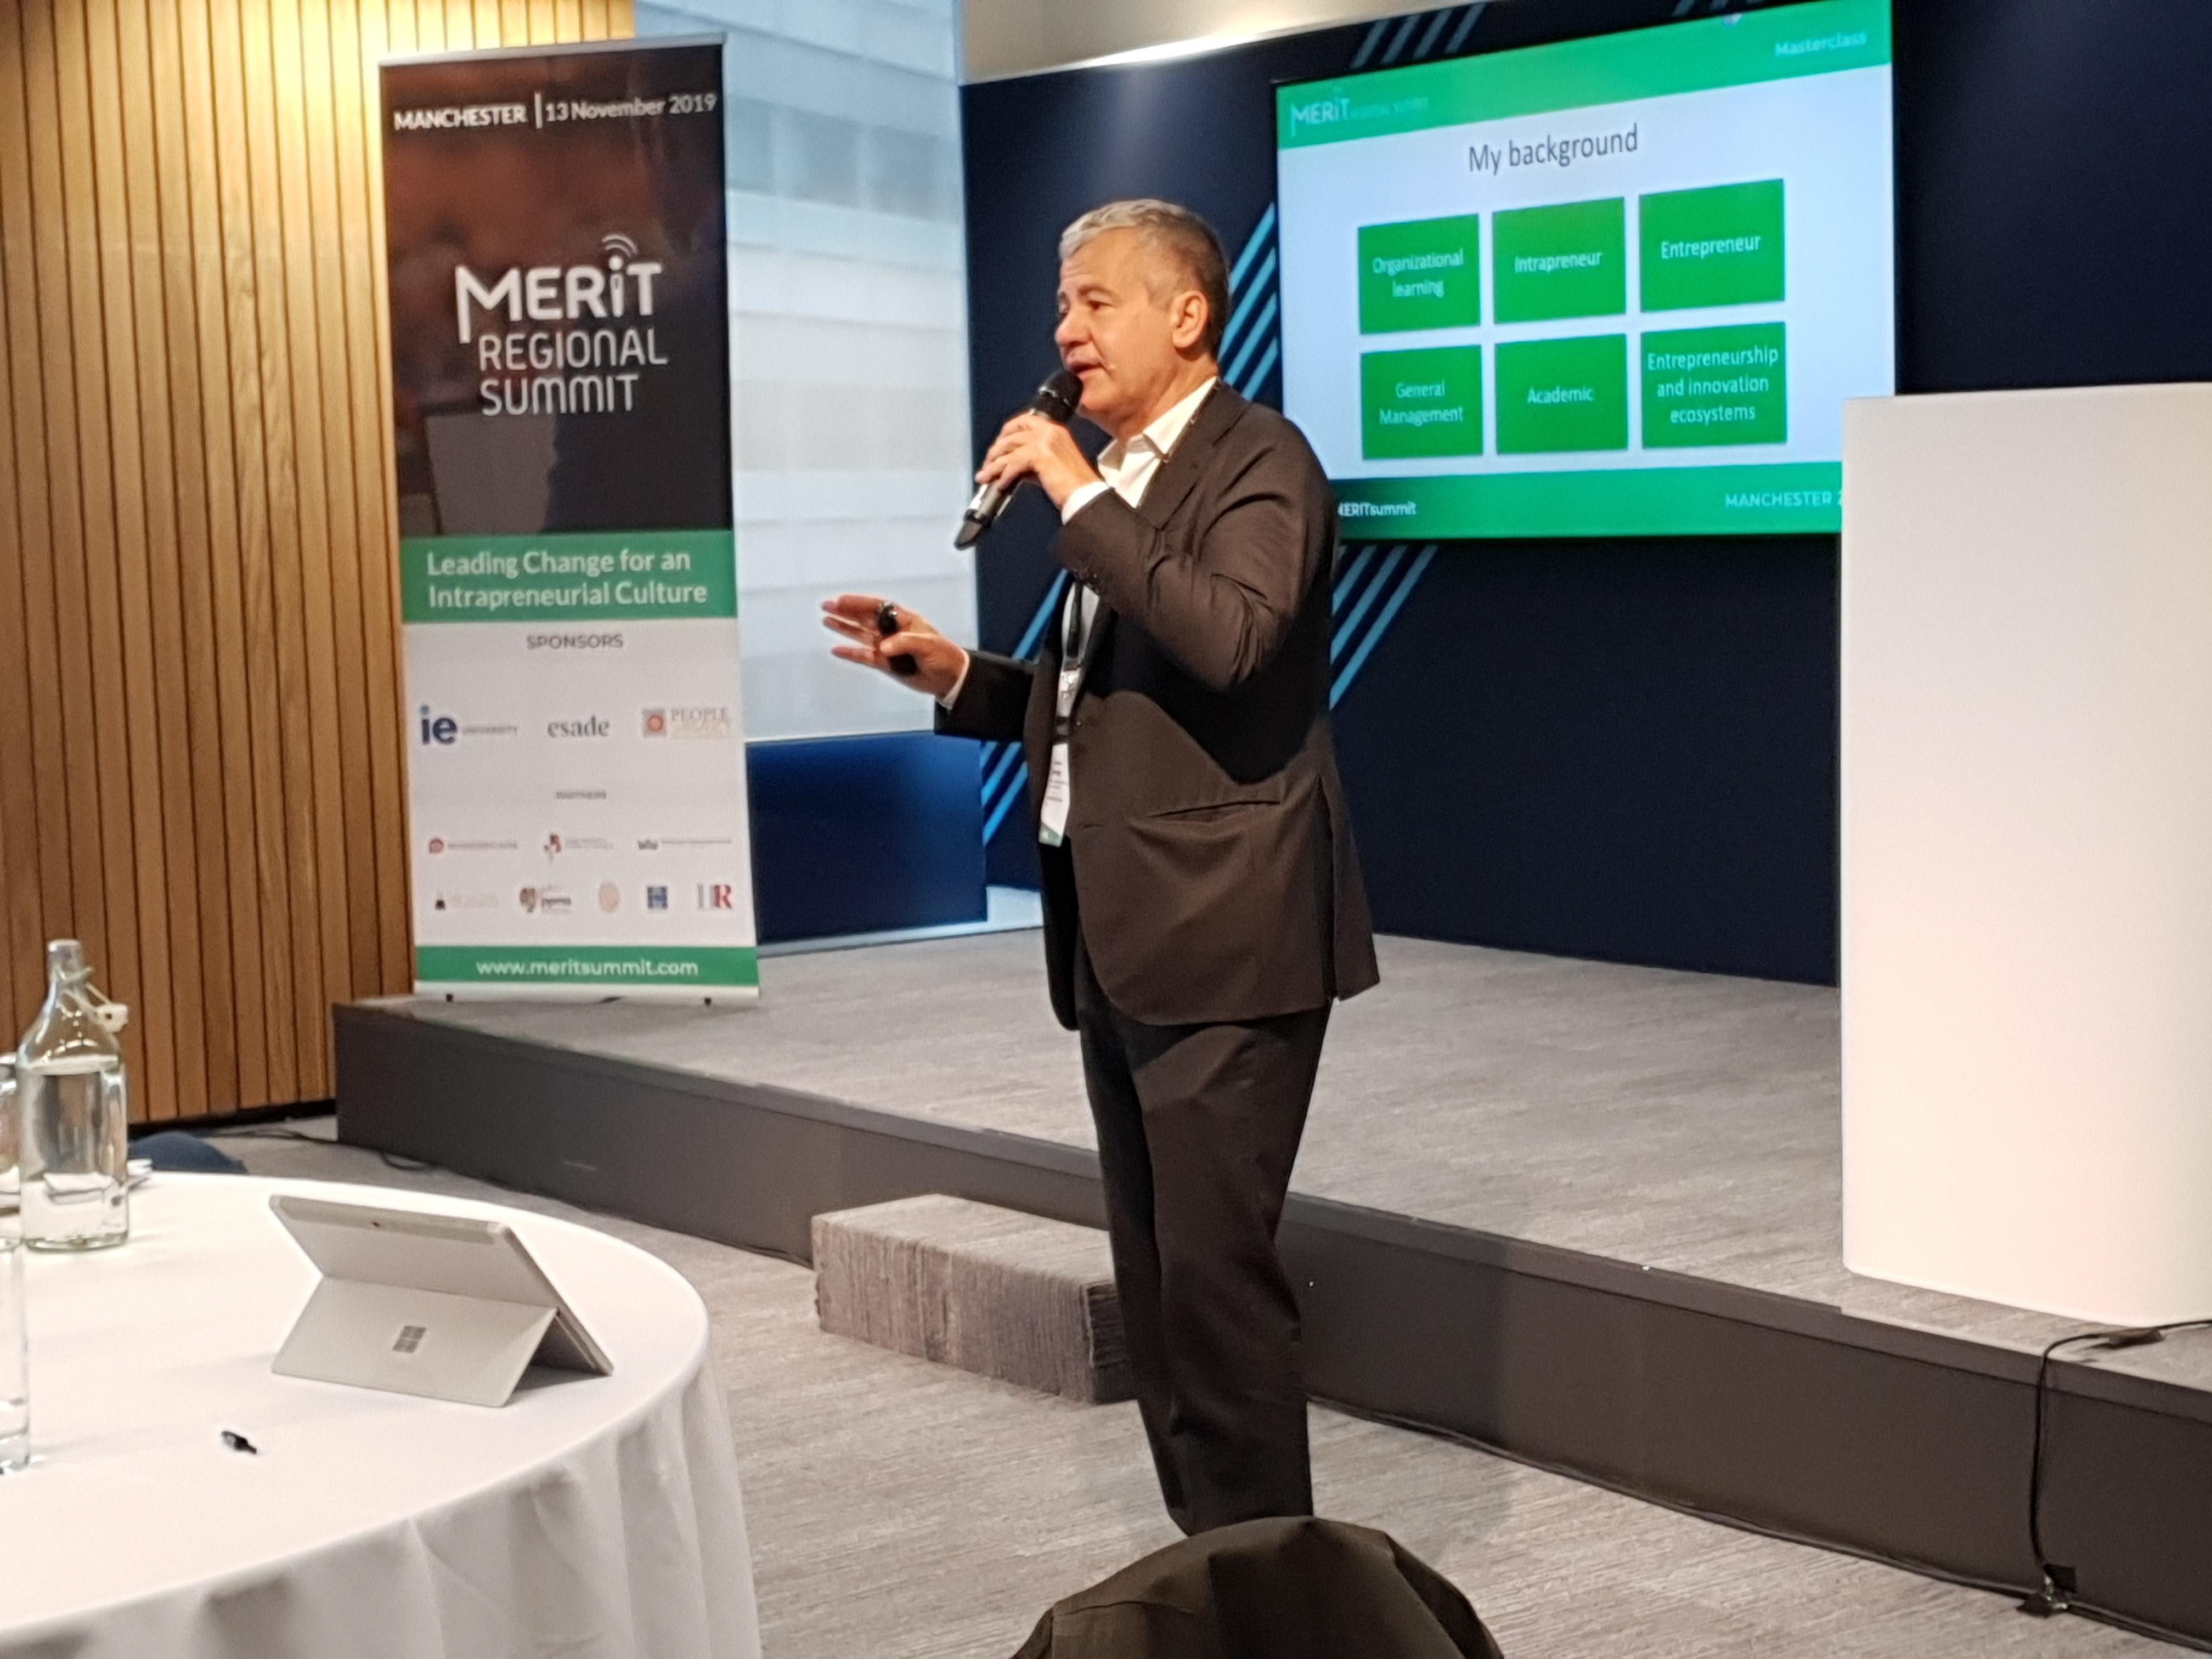 Professor Guillermo Cisneros of ESADE delivers a masterclass on intrapreneurship at the MERIT Regional Summit in Manchester.